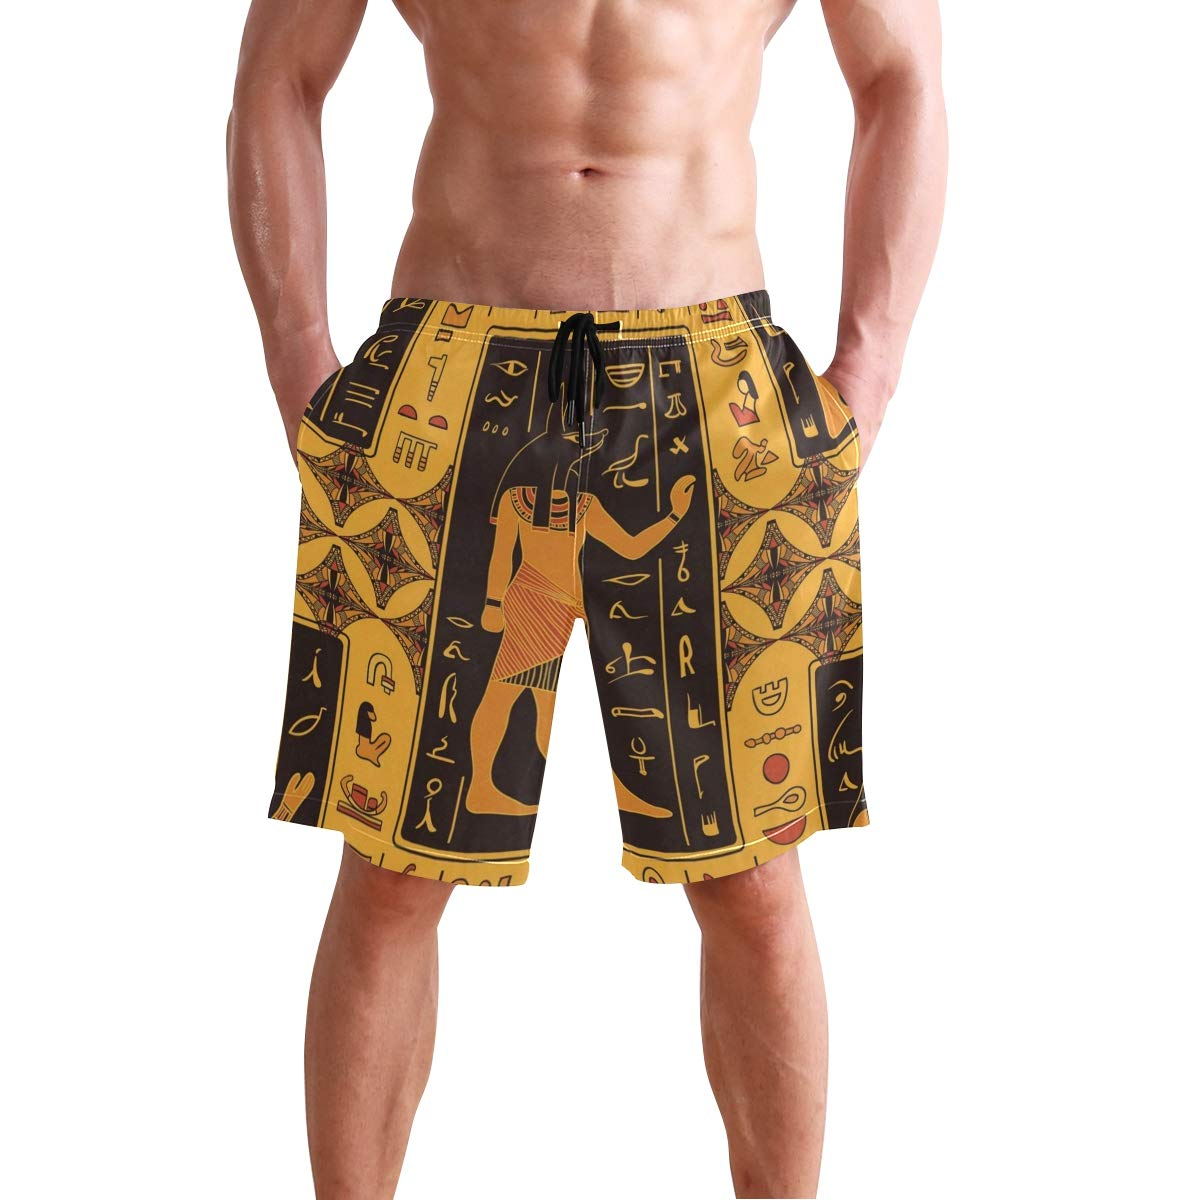 Mens Comfortable Underwear Running Horses Boxer Briefs for Men